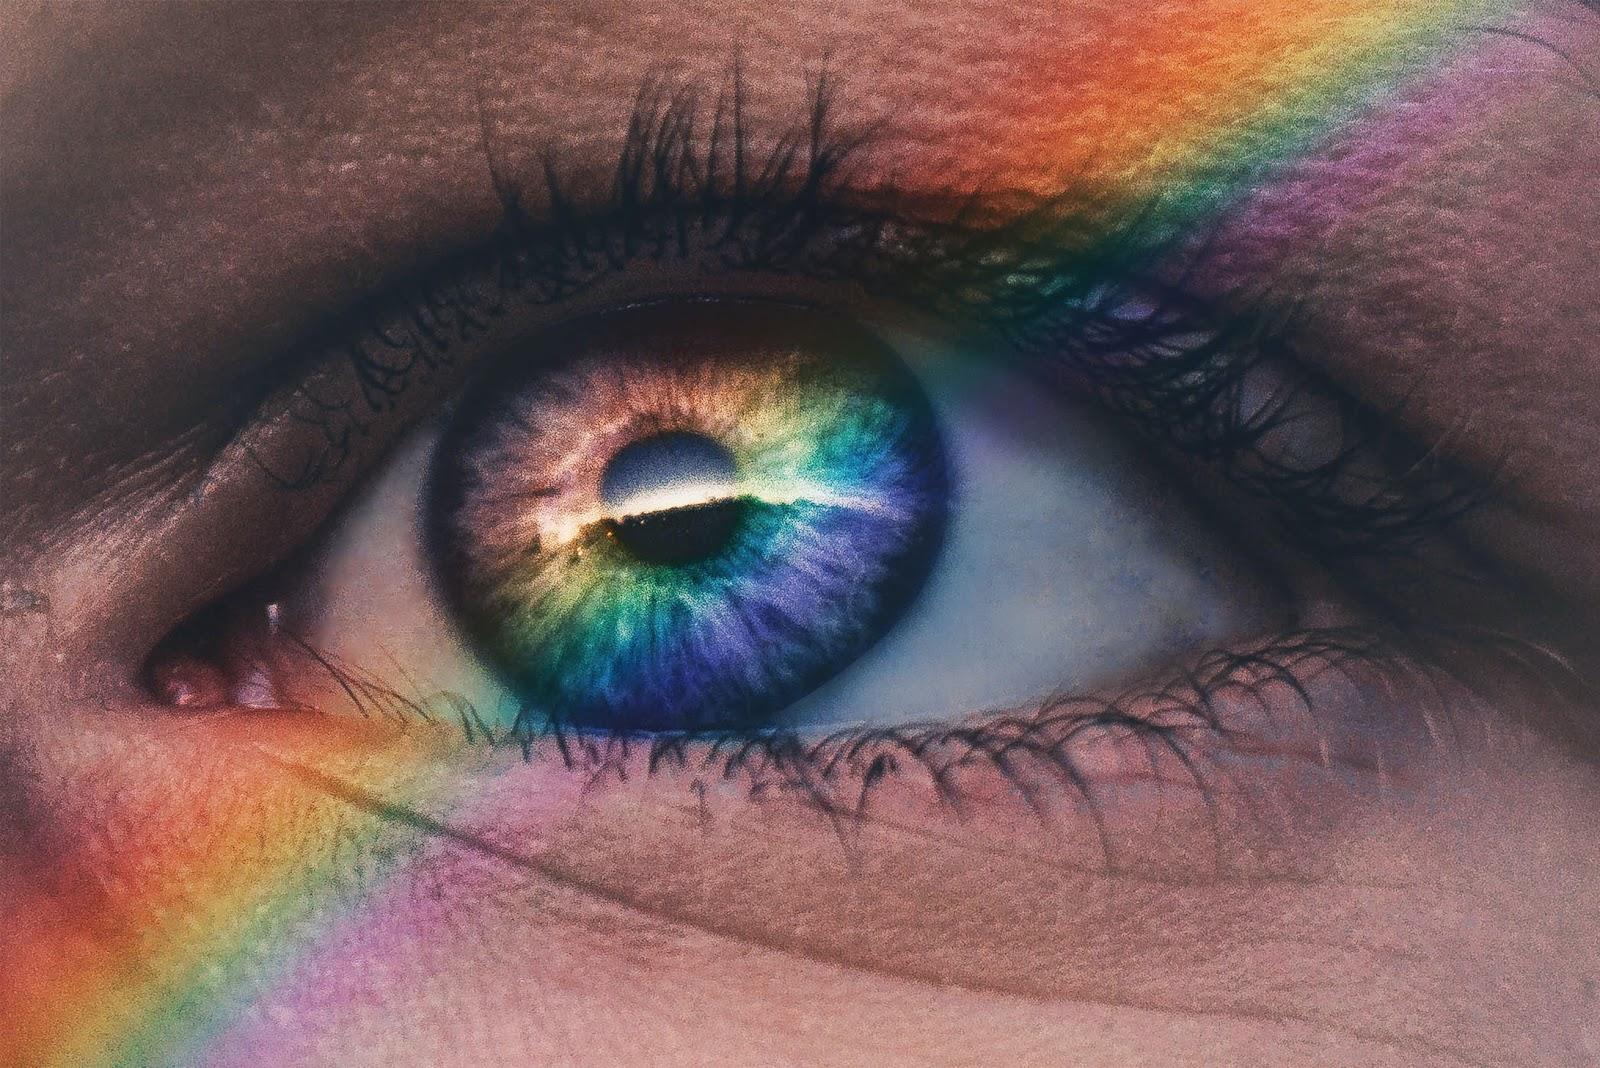 Left eye twitching spiritual meaning